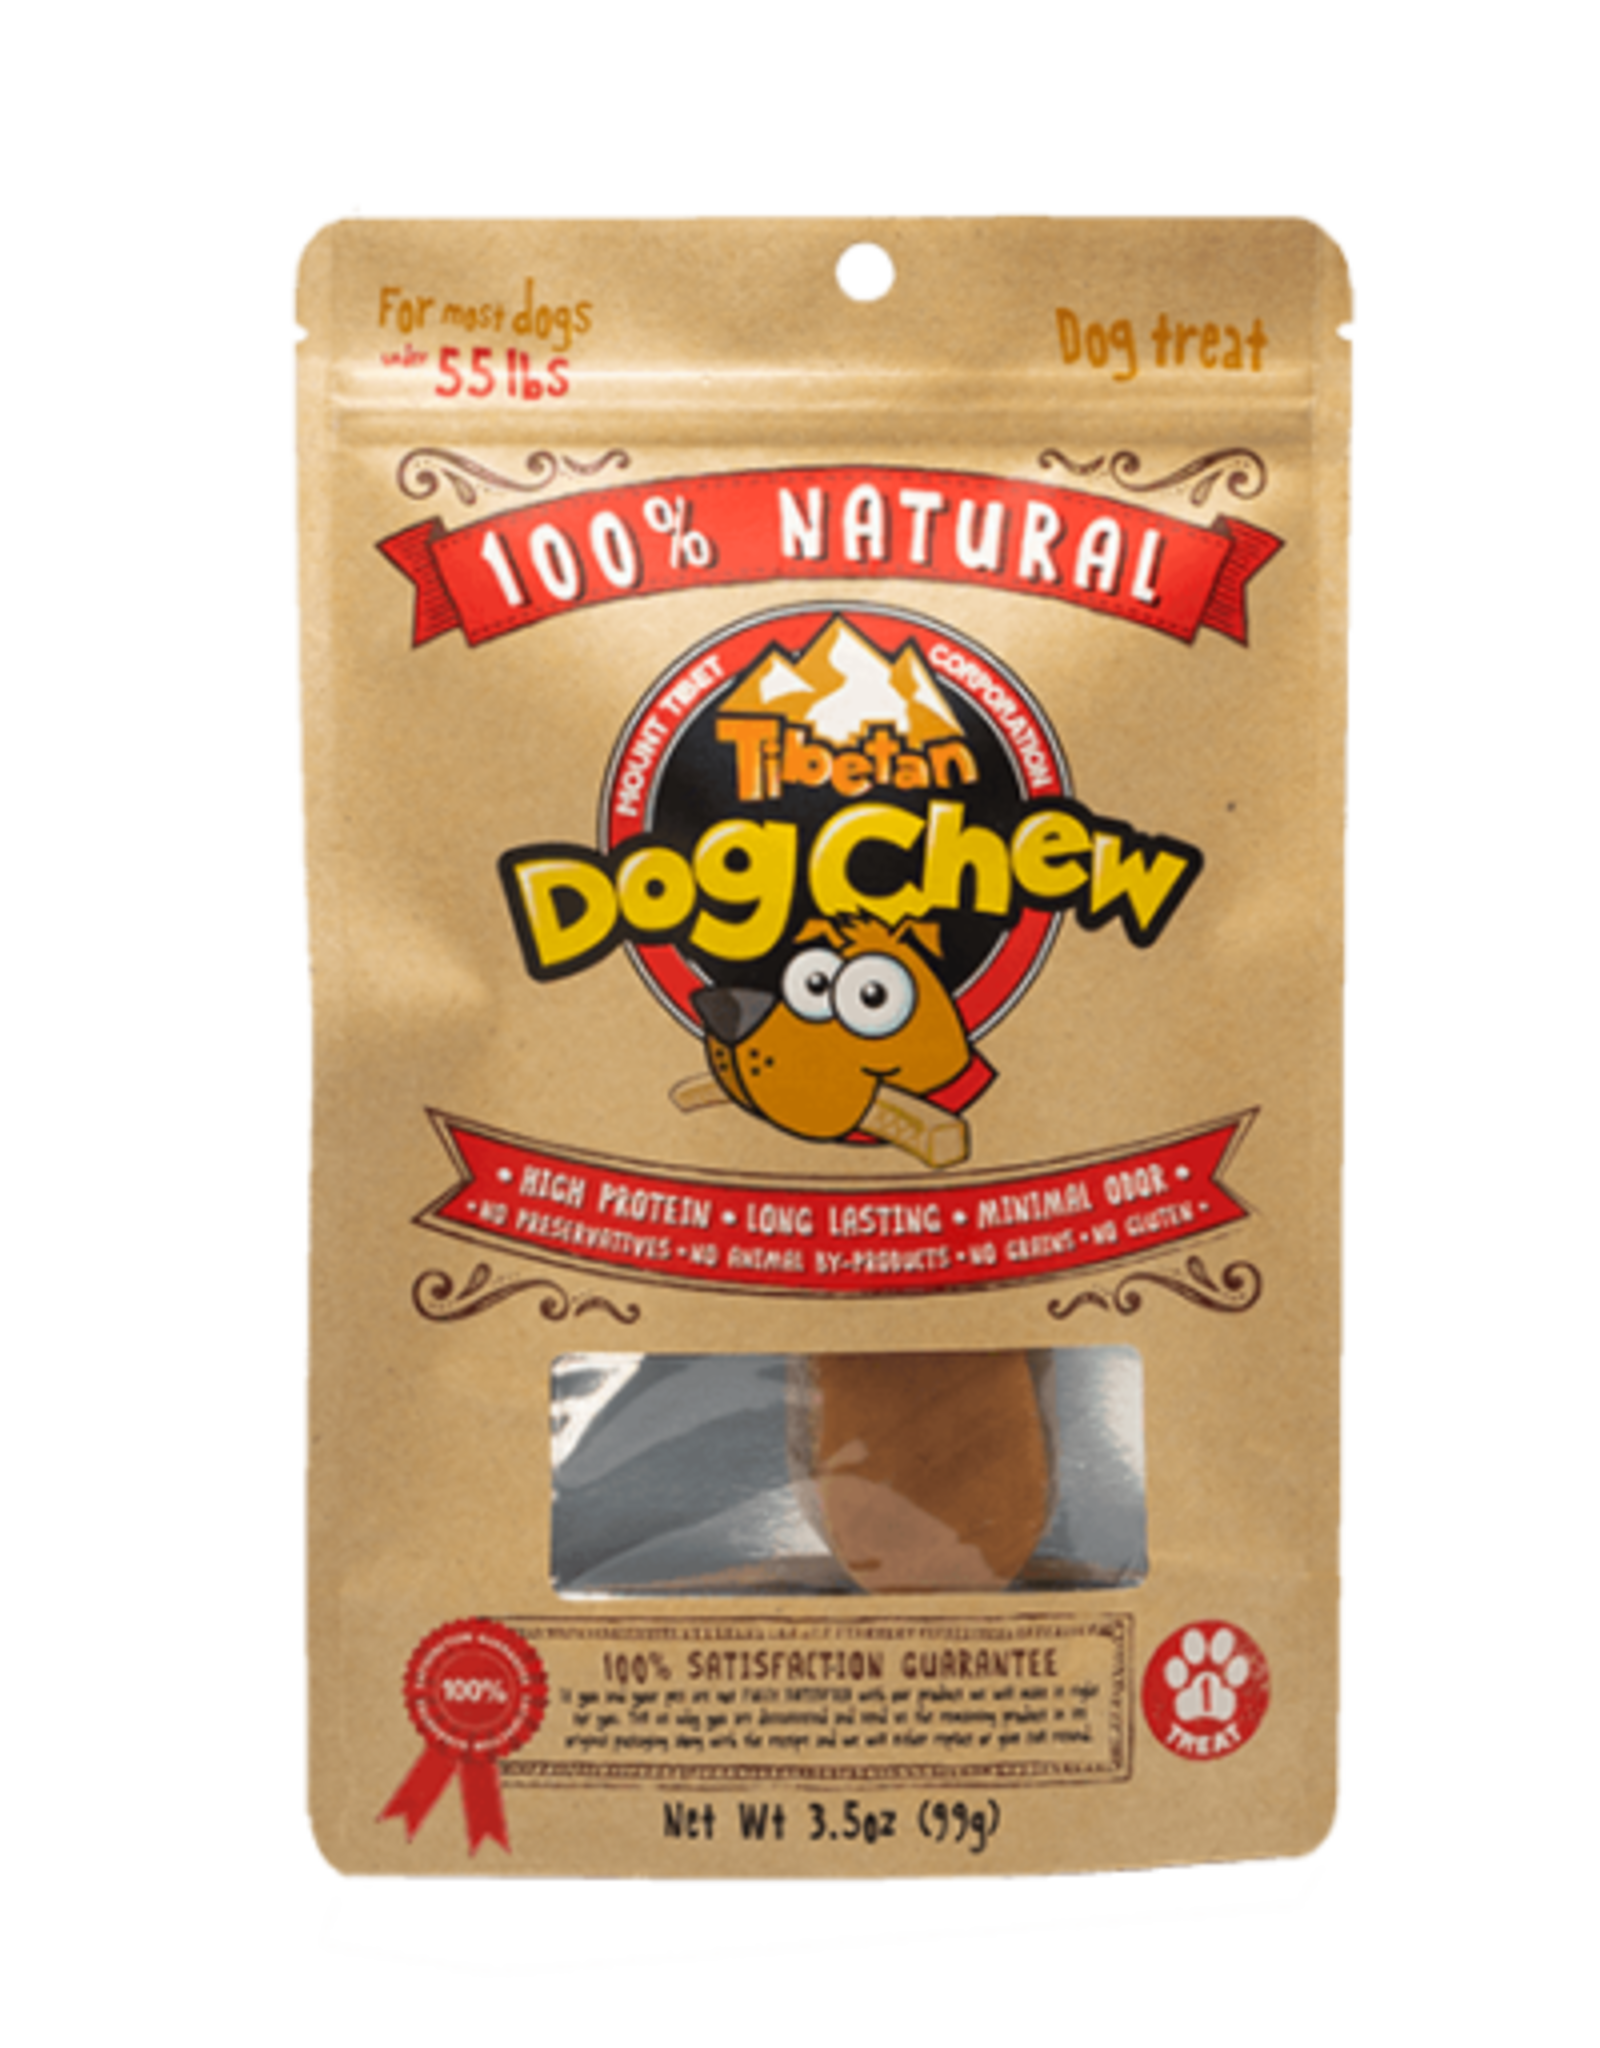 100% Natural 100% Natural Tibetan Dog Chew L